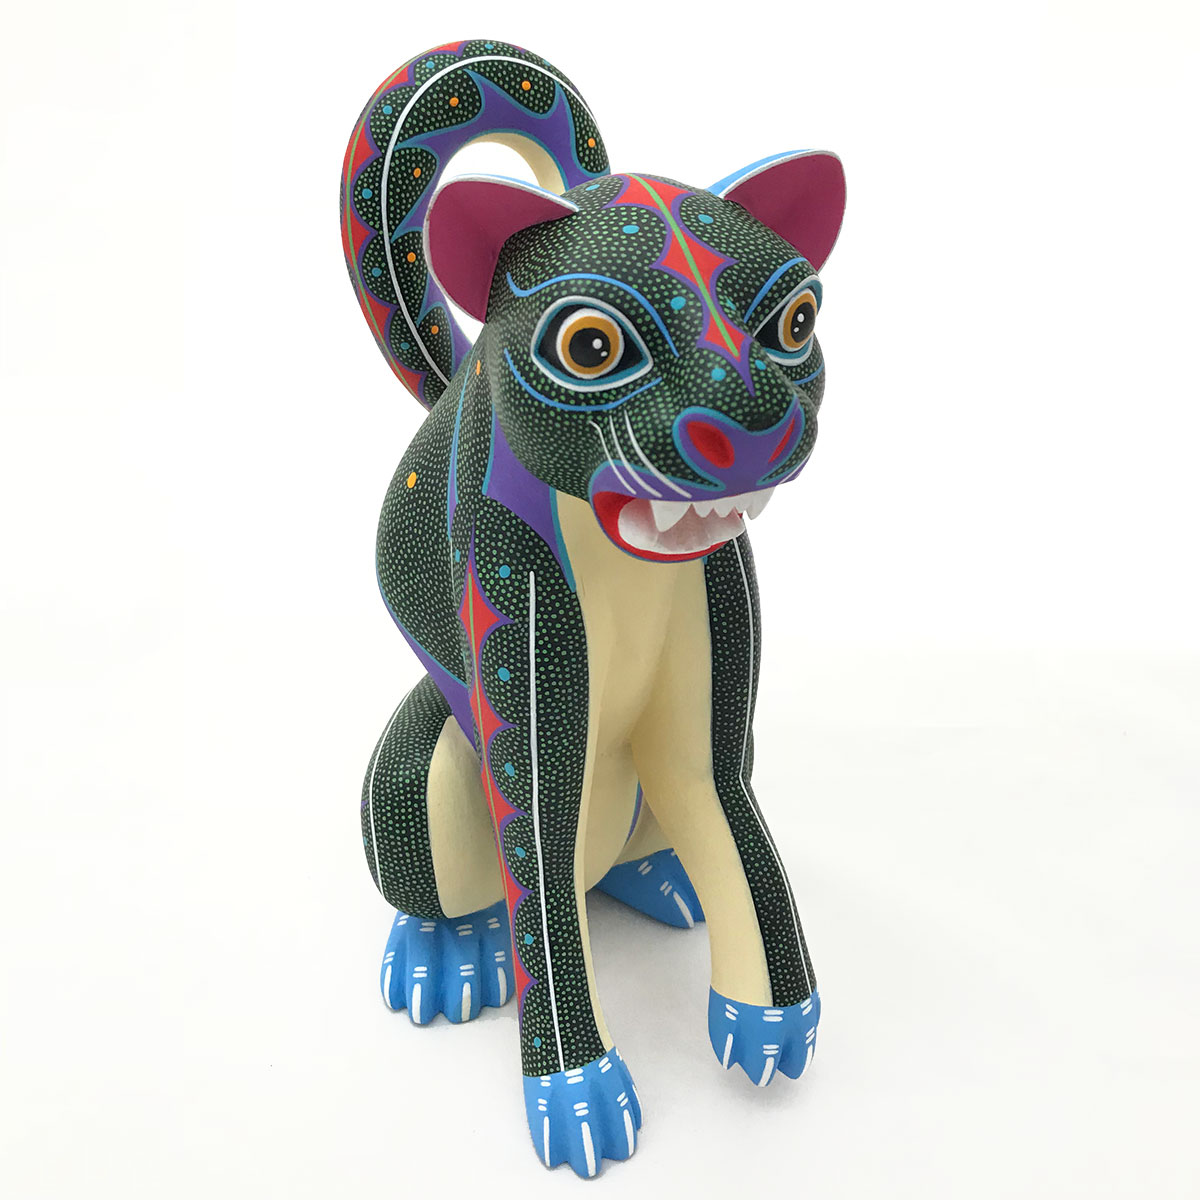 Narciso Gonzalez Ramirez & Rubi Hernandez Pinos Narciso Gonzalez Ramirez & Rubi Hernandez Pinos: Panther Cats